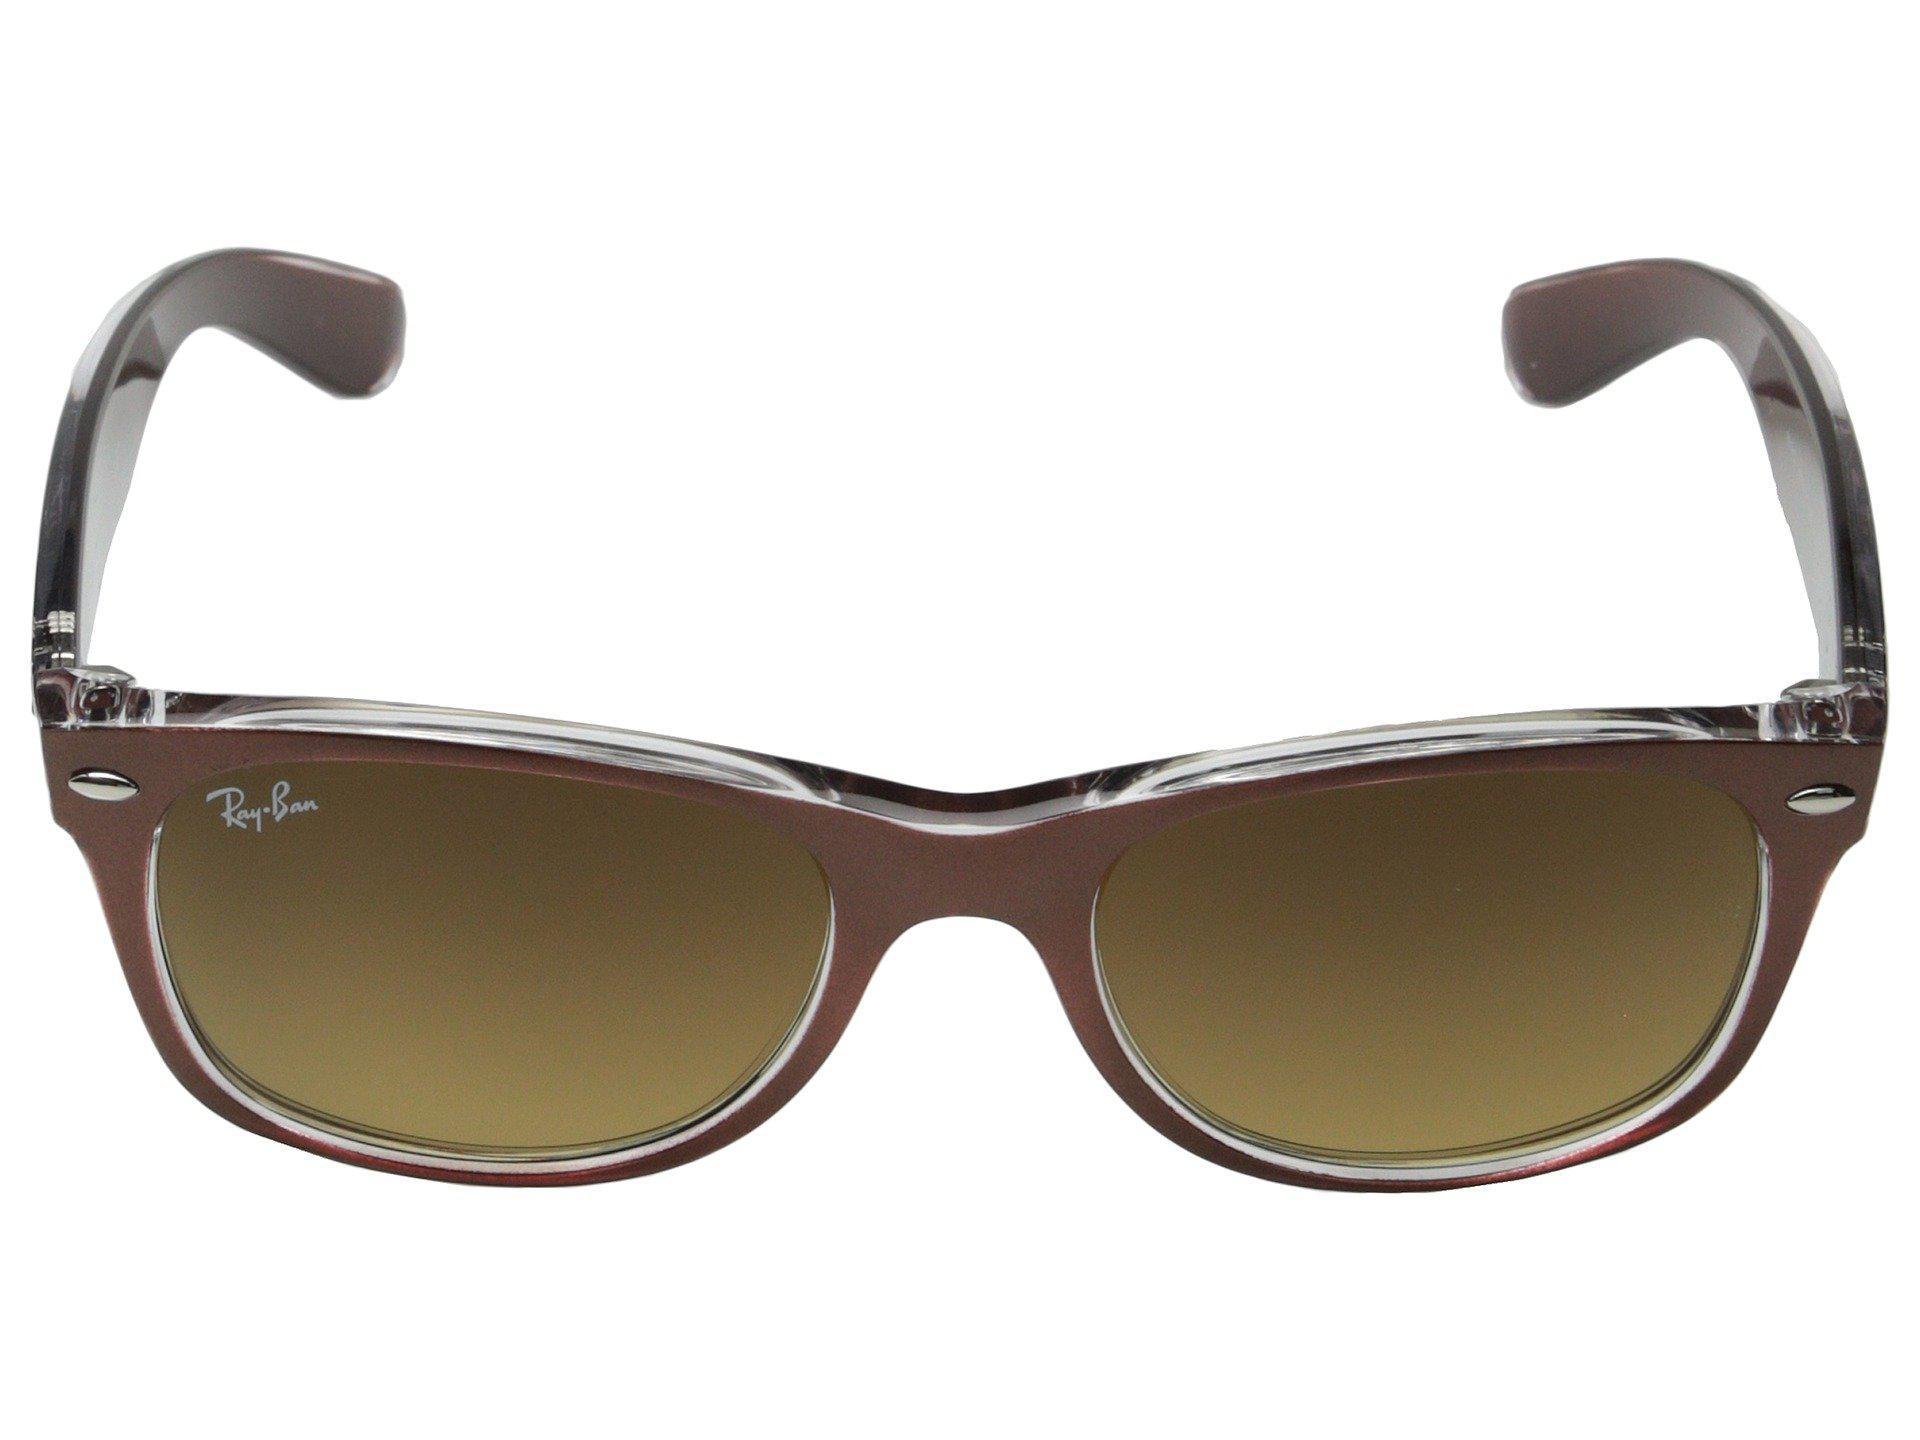 43d5c1864571d ... low price ray ban brown rb2132 new wayfarer 52mm black tan sport  sunglasses . view fullscreen